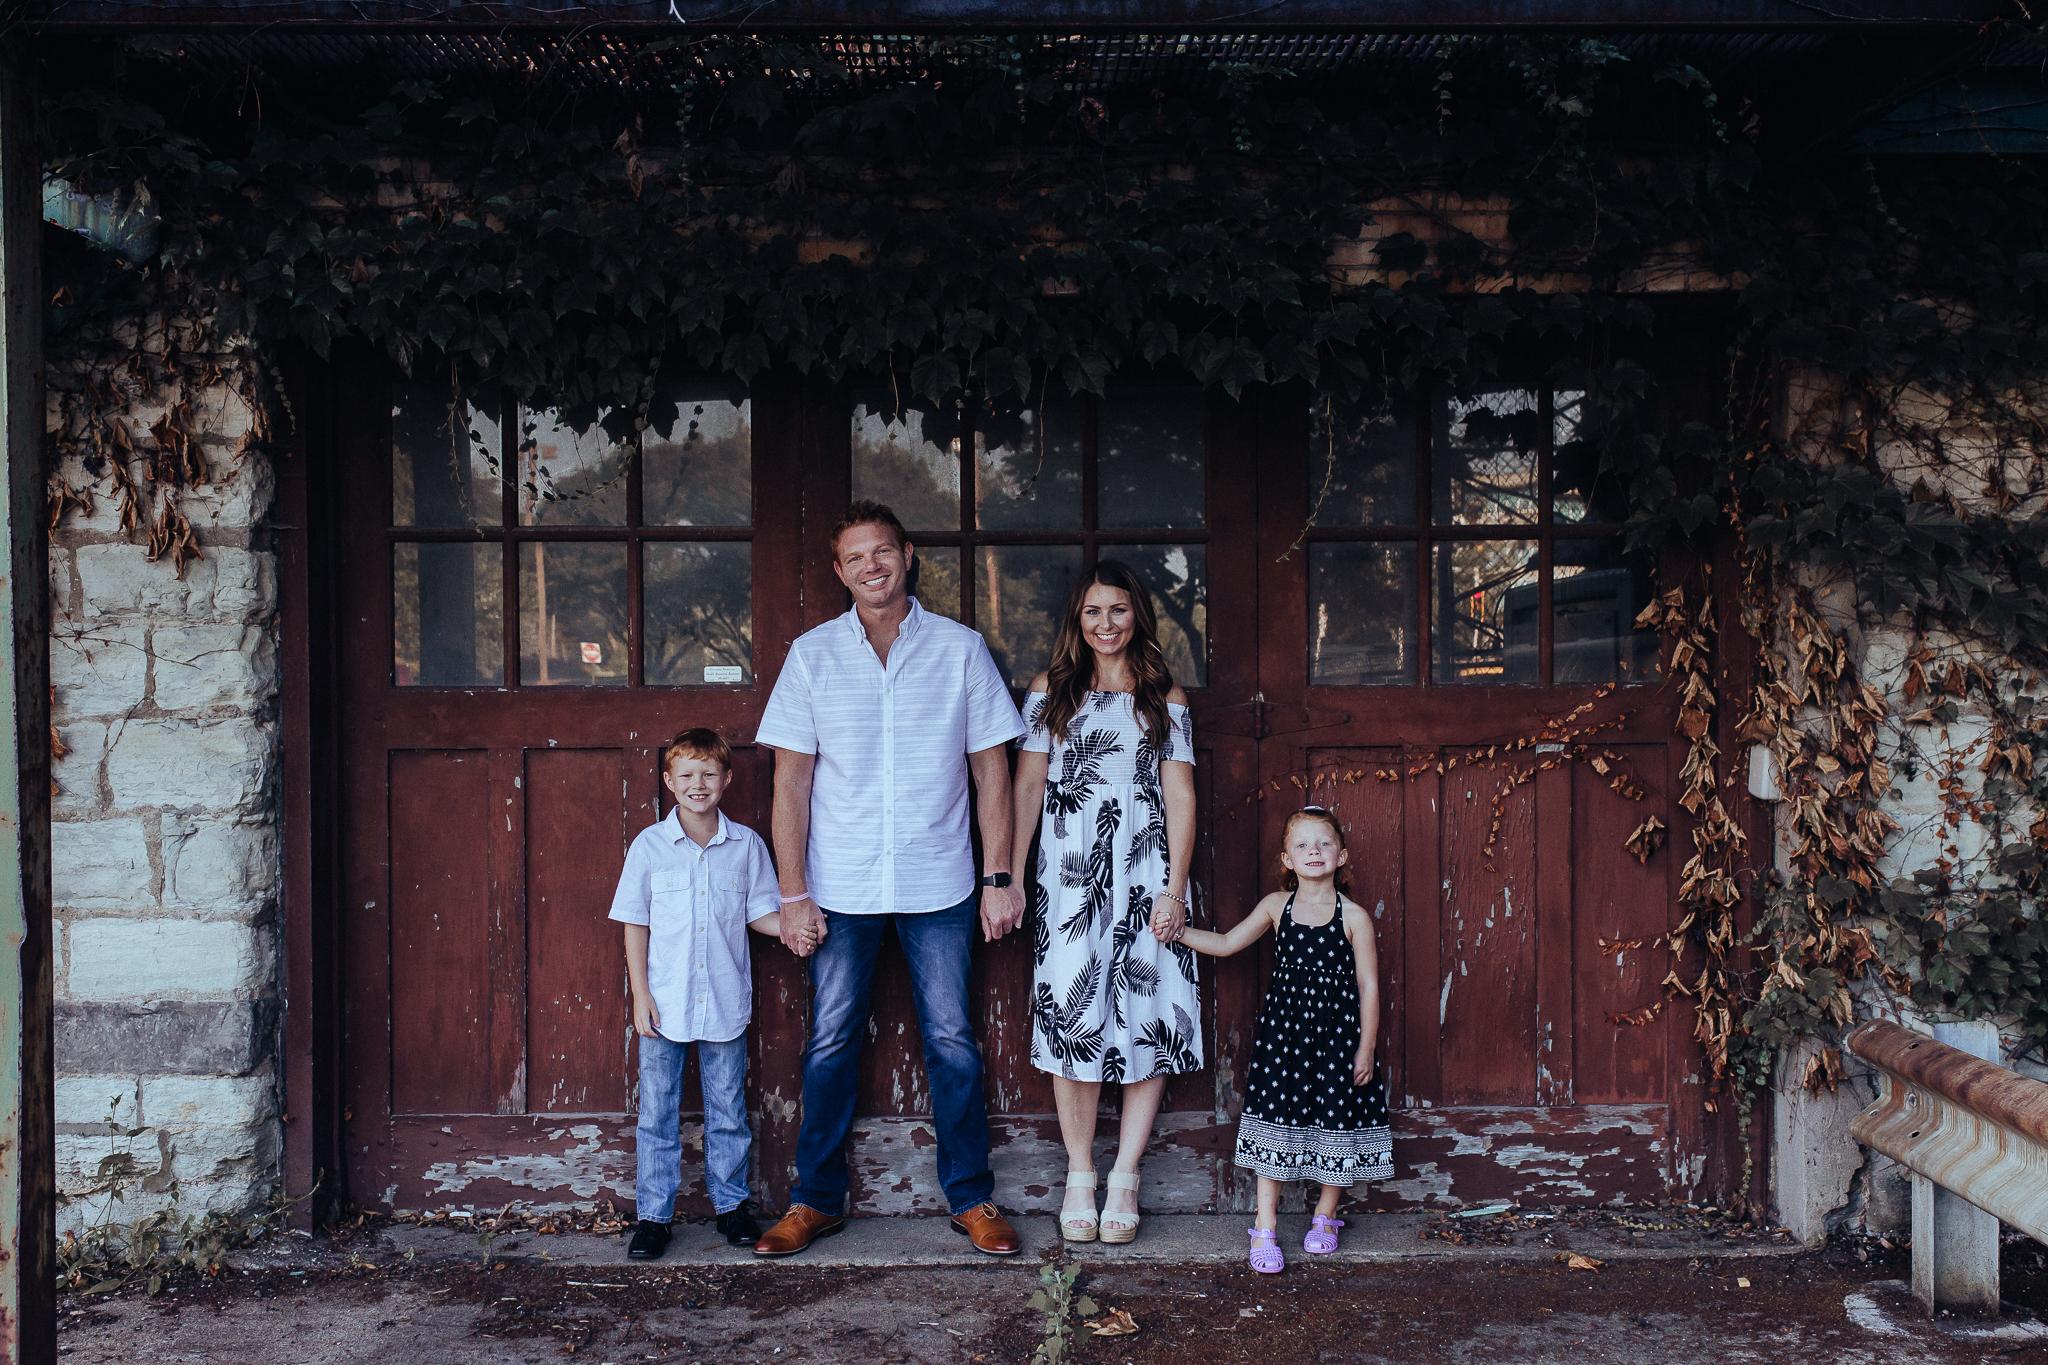 therogersfamily-48.JPG